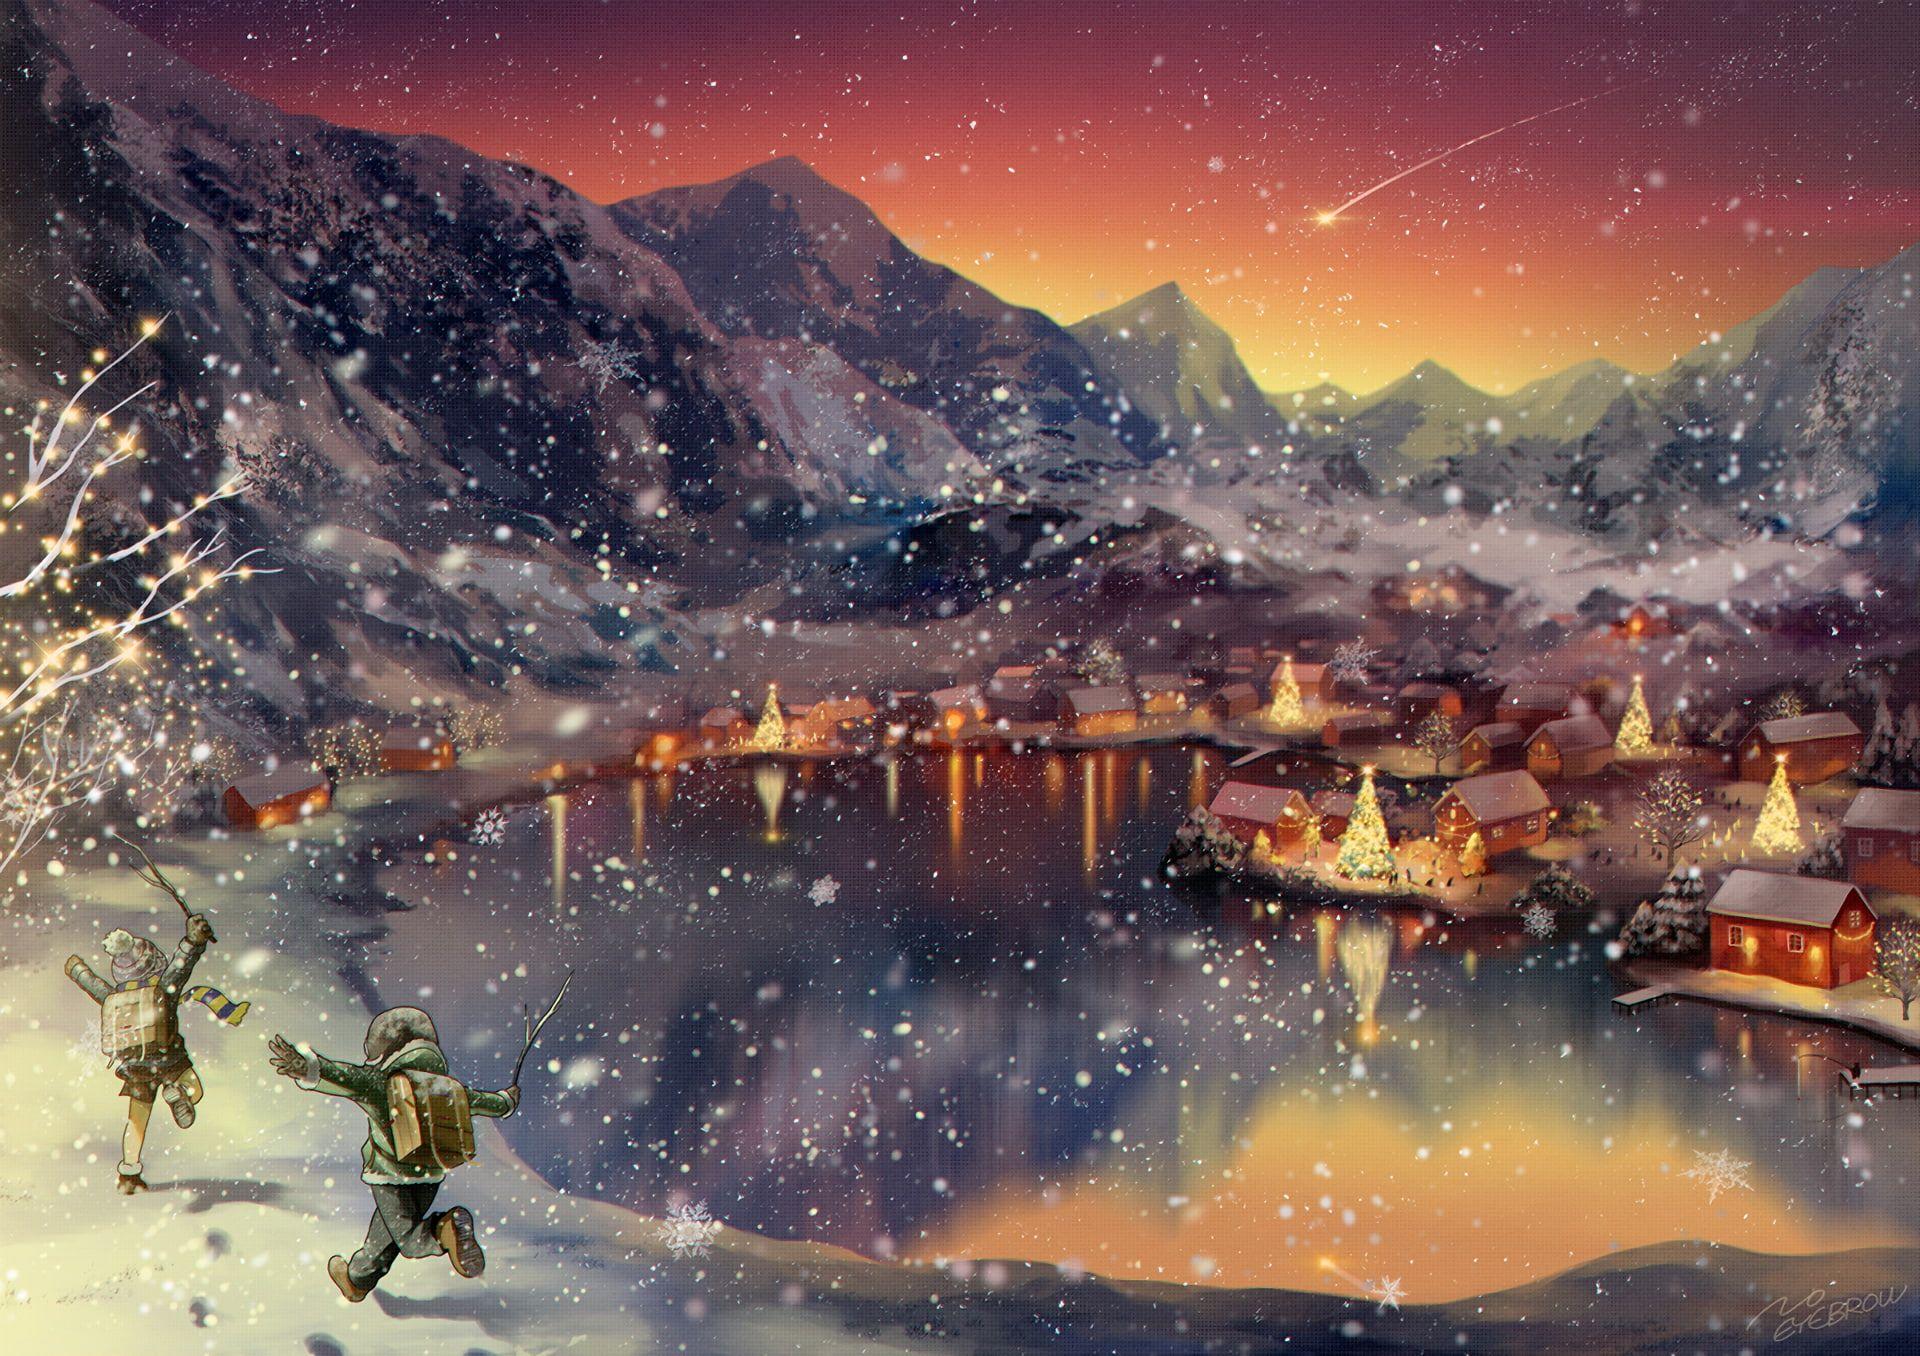 Landscape Anime Winter Mountains Sunset Artwork Lake Christmas 1080p Wallpaper Hdwallpa Beautiful Scenery Wallpaper Sunset Artwork Scenery Wallpaper